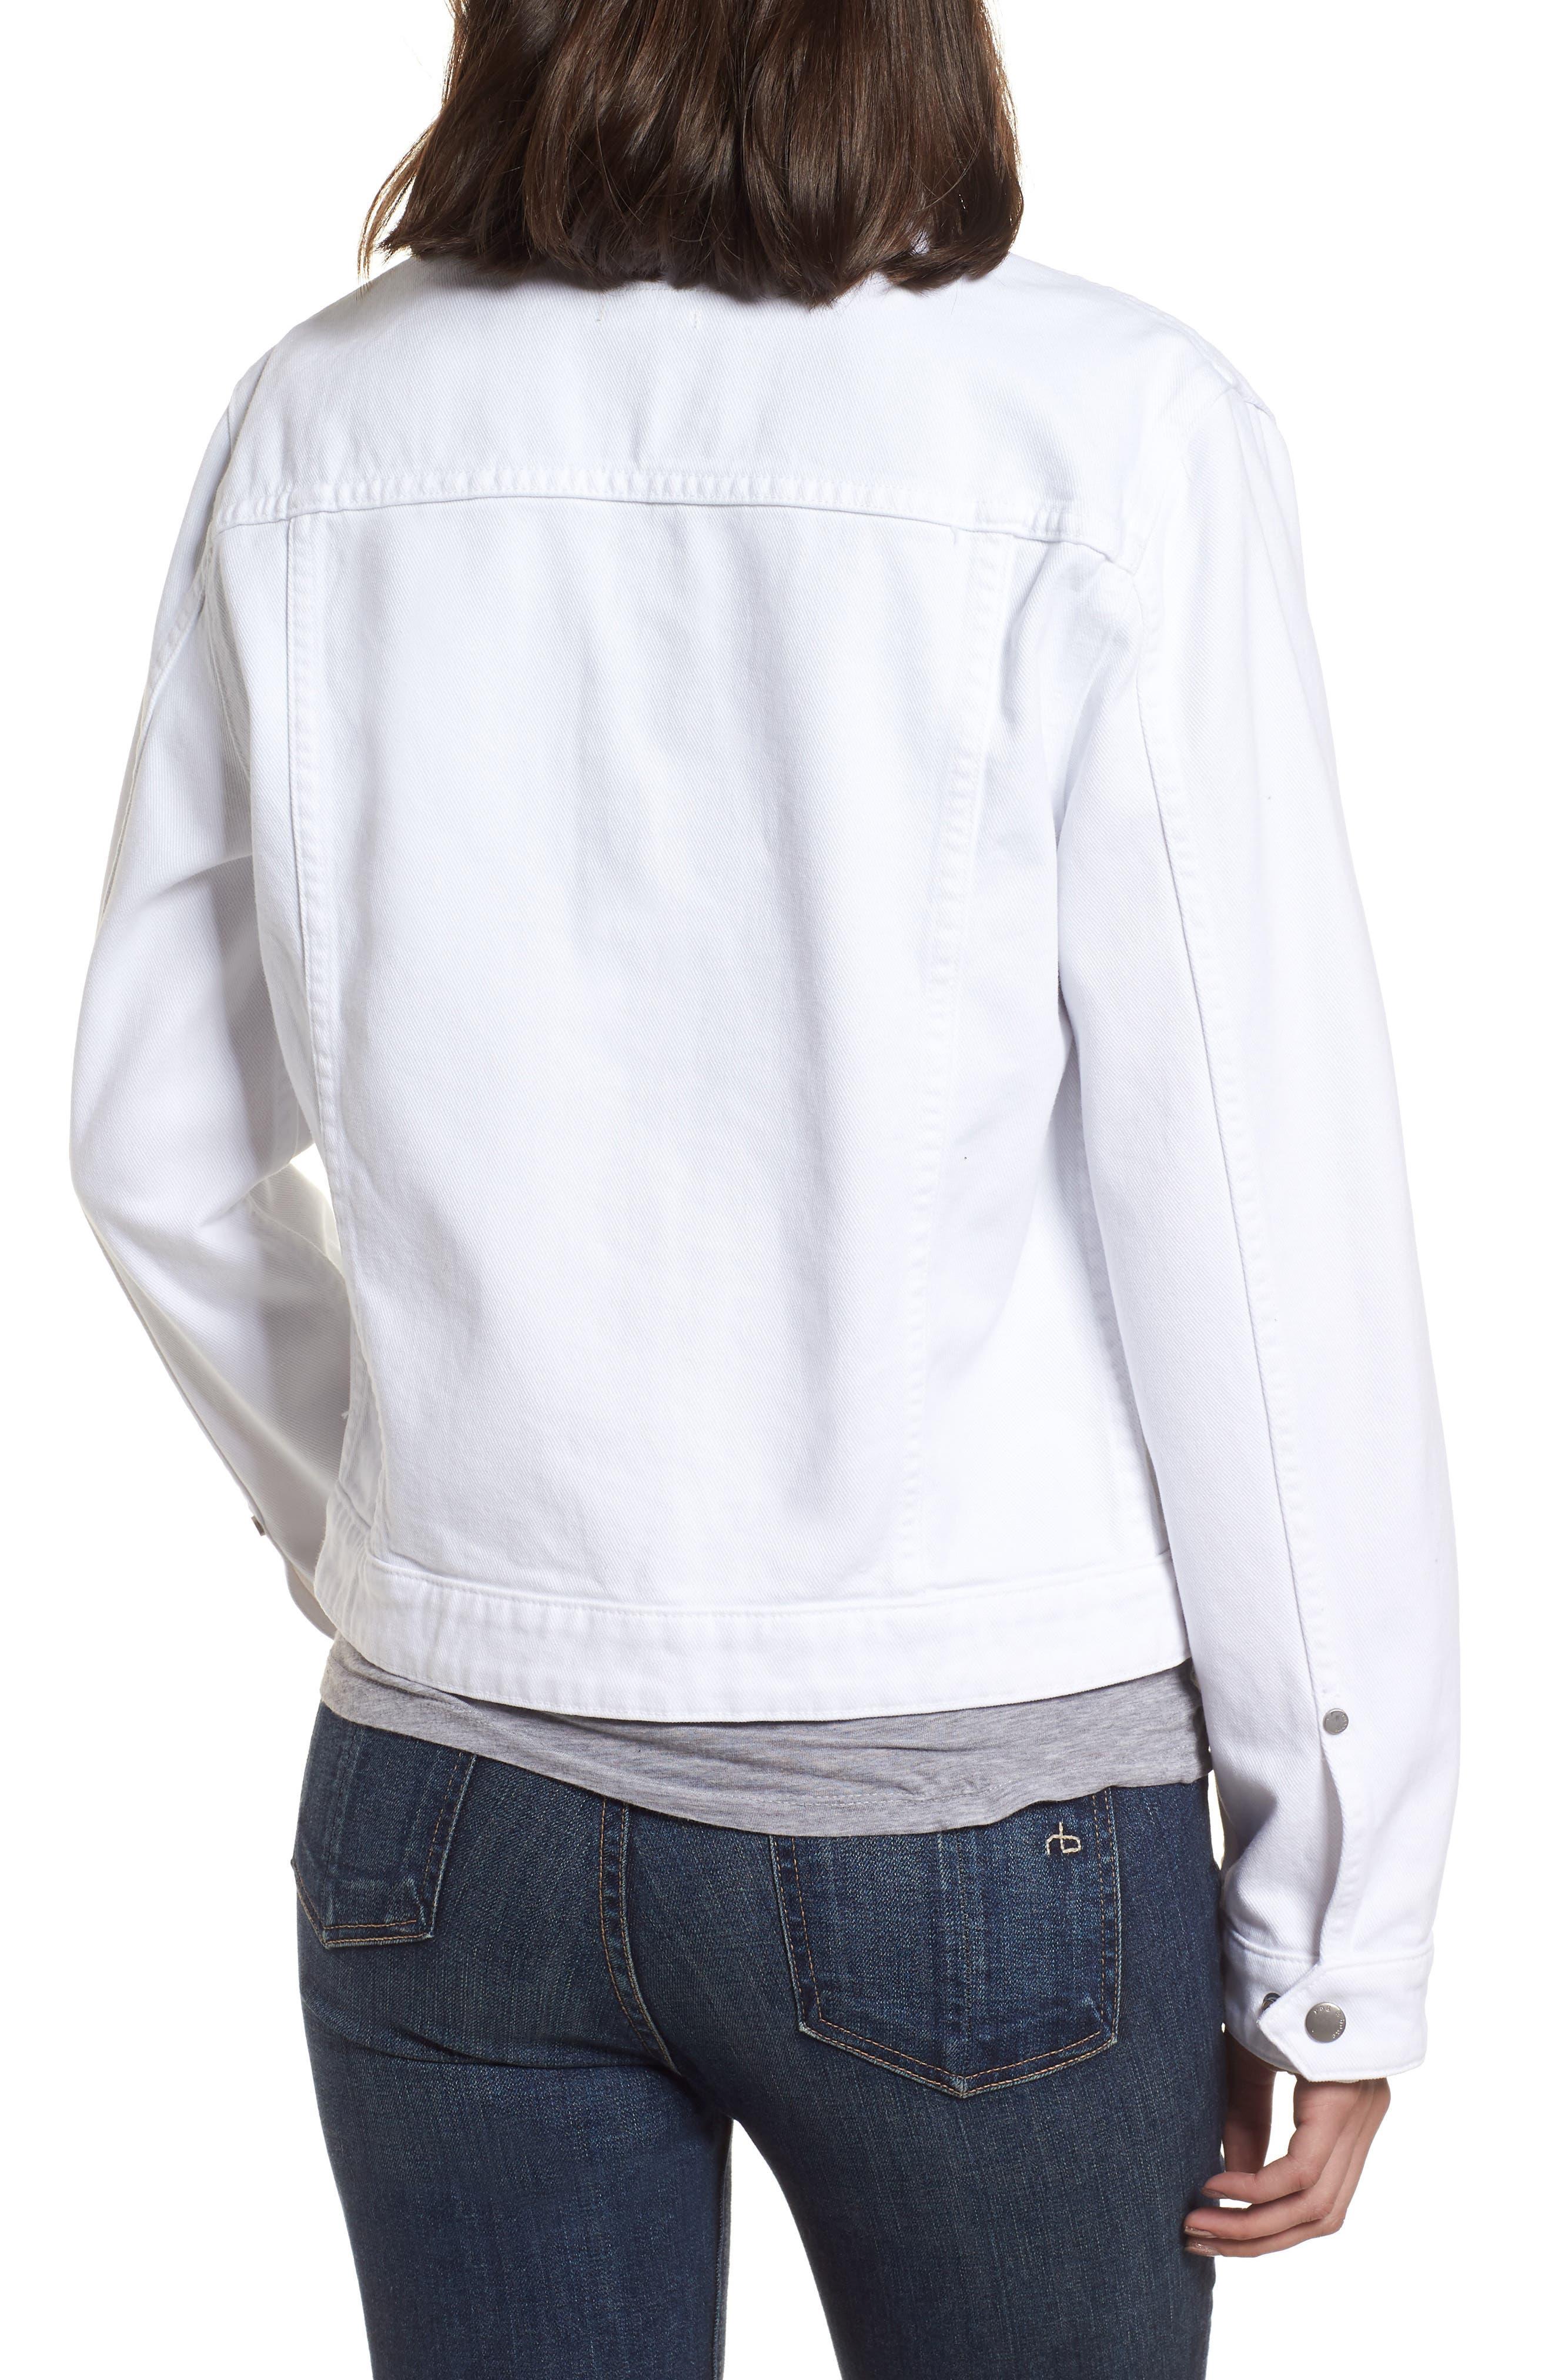 Nico Denim Jacket,                             Alternate thumbnail 2, color,                             White